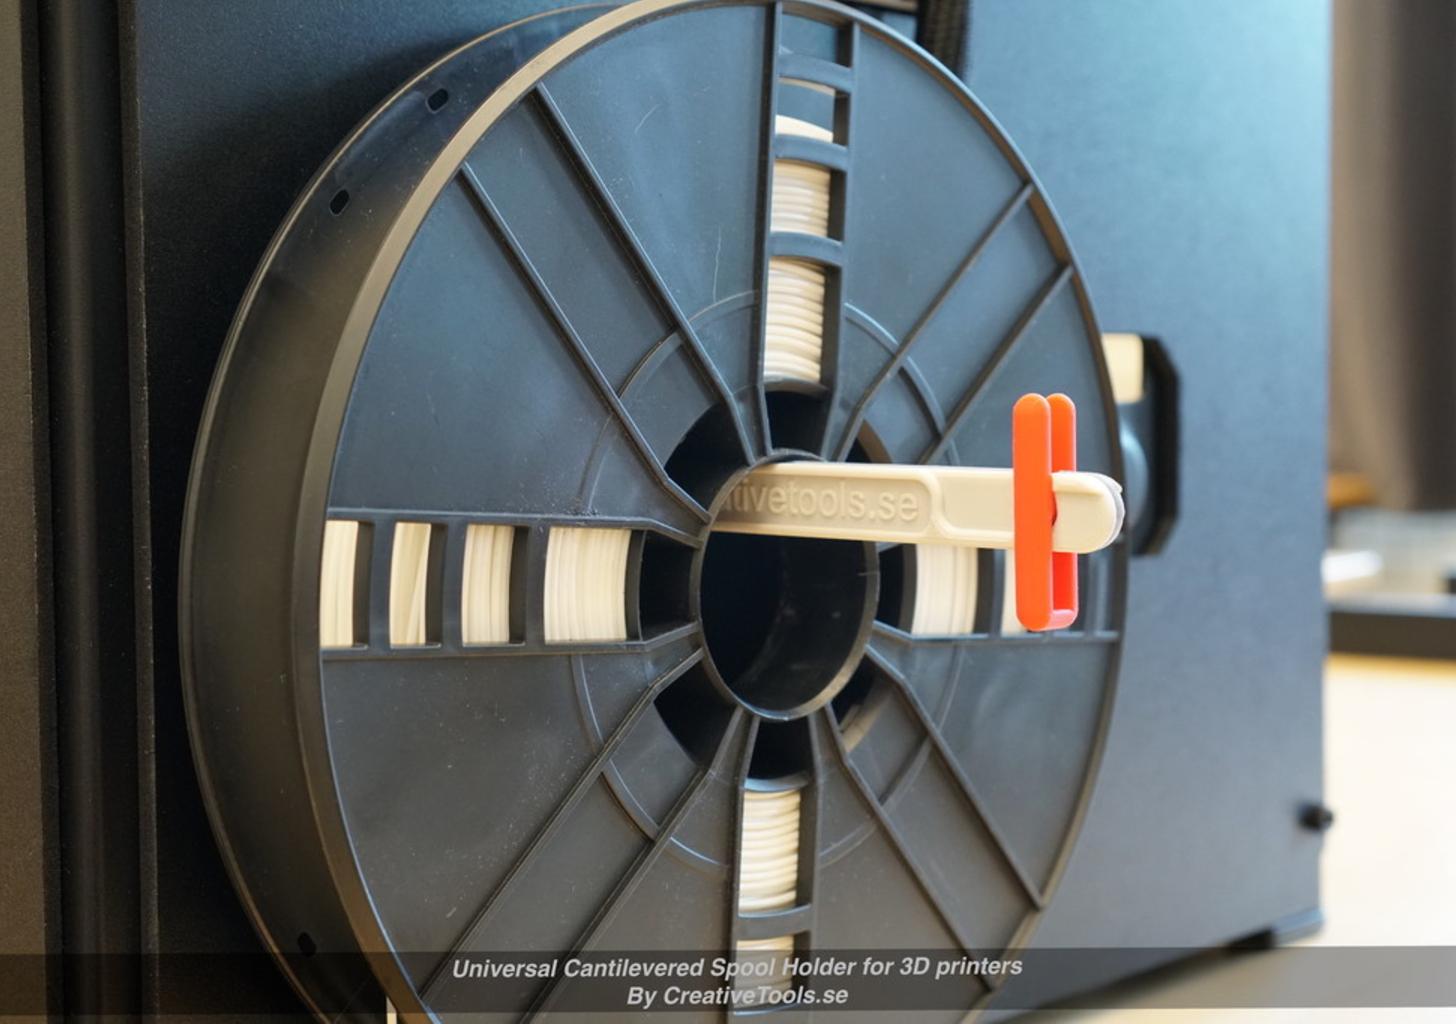 Capture d'écran 2017-05-09 à 09.46.17.png Download free STL file Universal Cantilevered Spool Holder for 3D printers • 3D printing design, CreativeTools